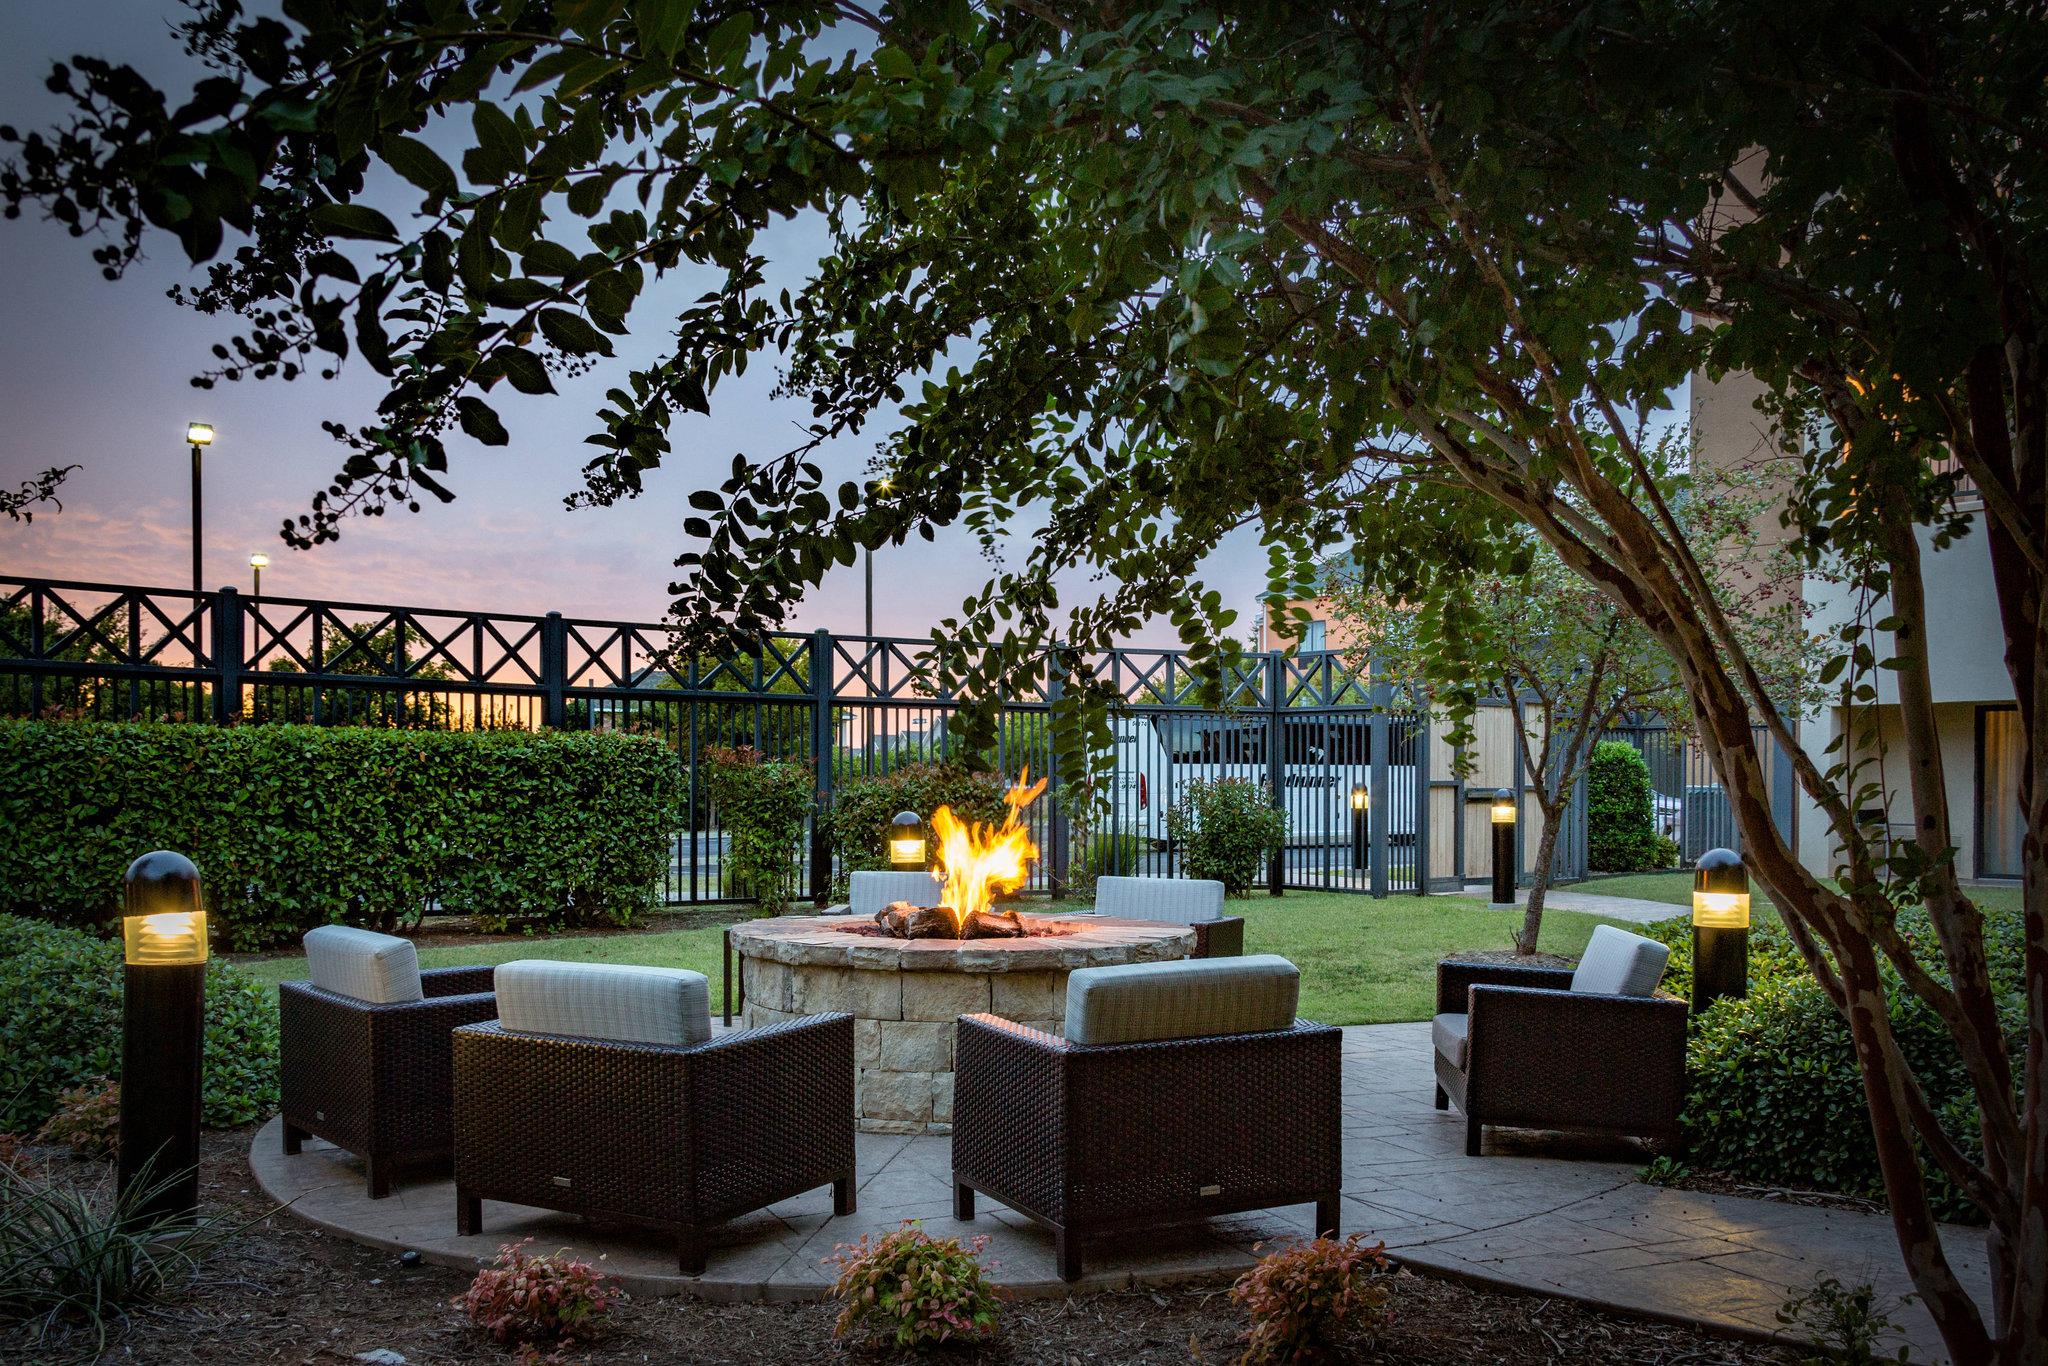 Courtyard by Marriott Norman